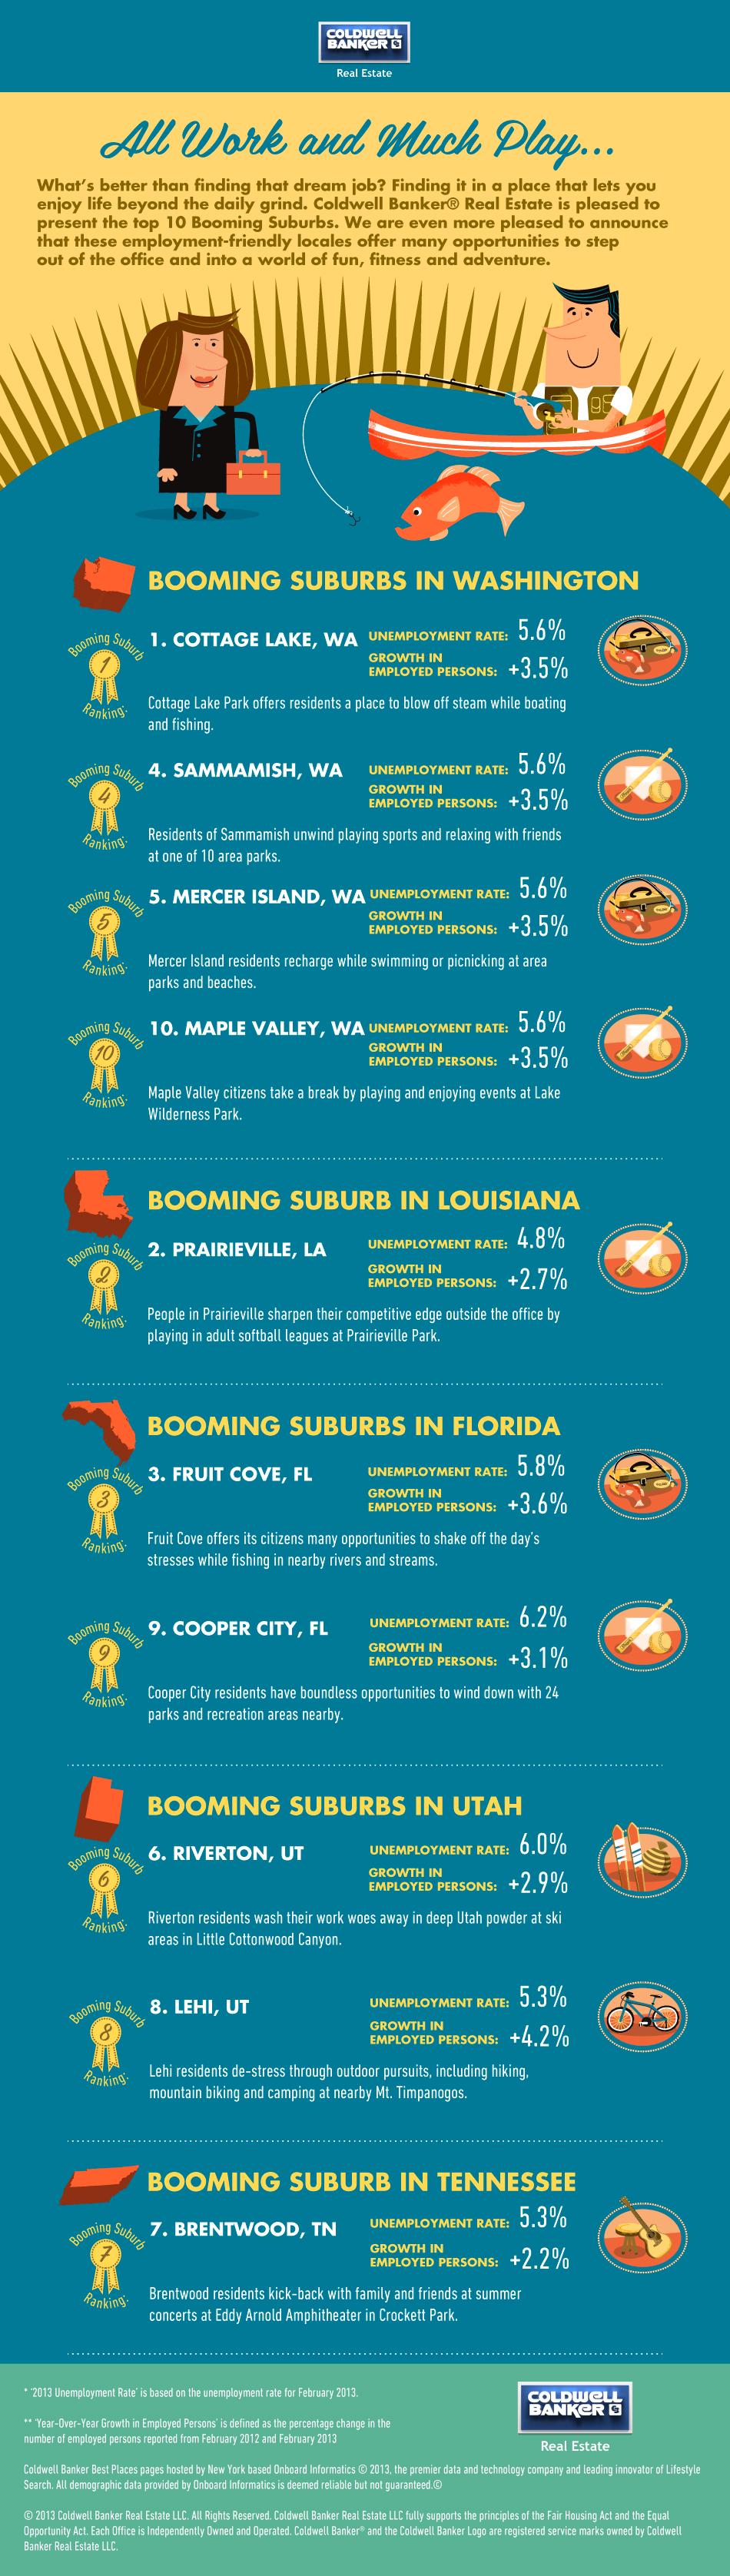 Booming Suburbs